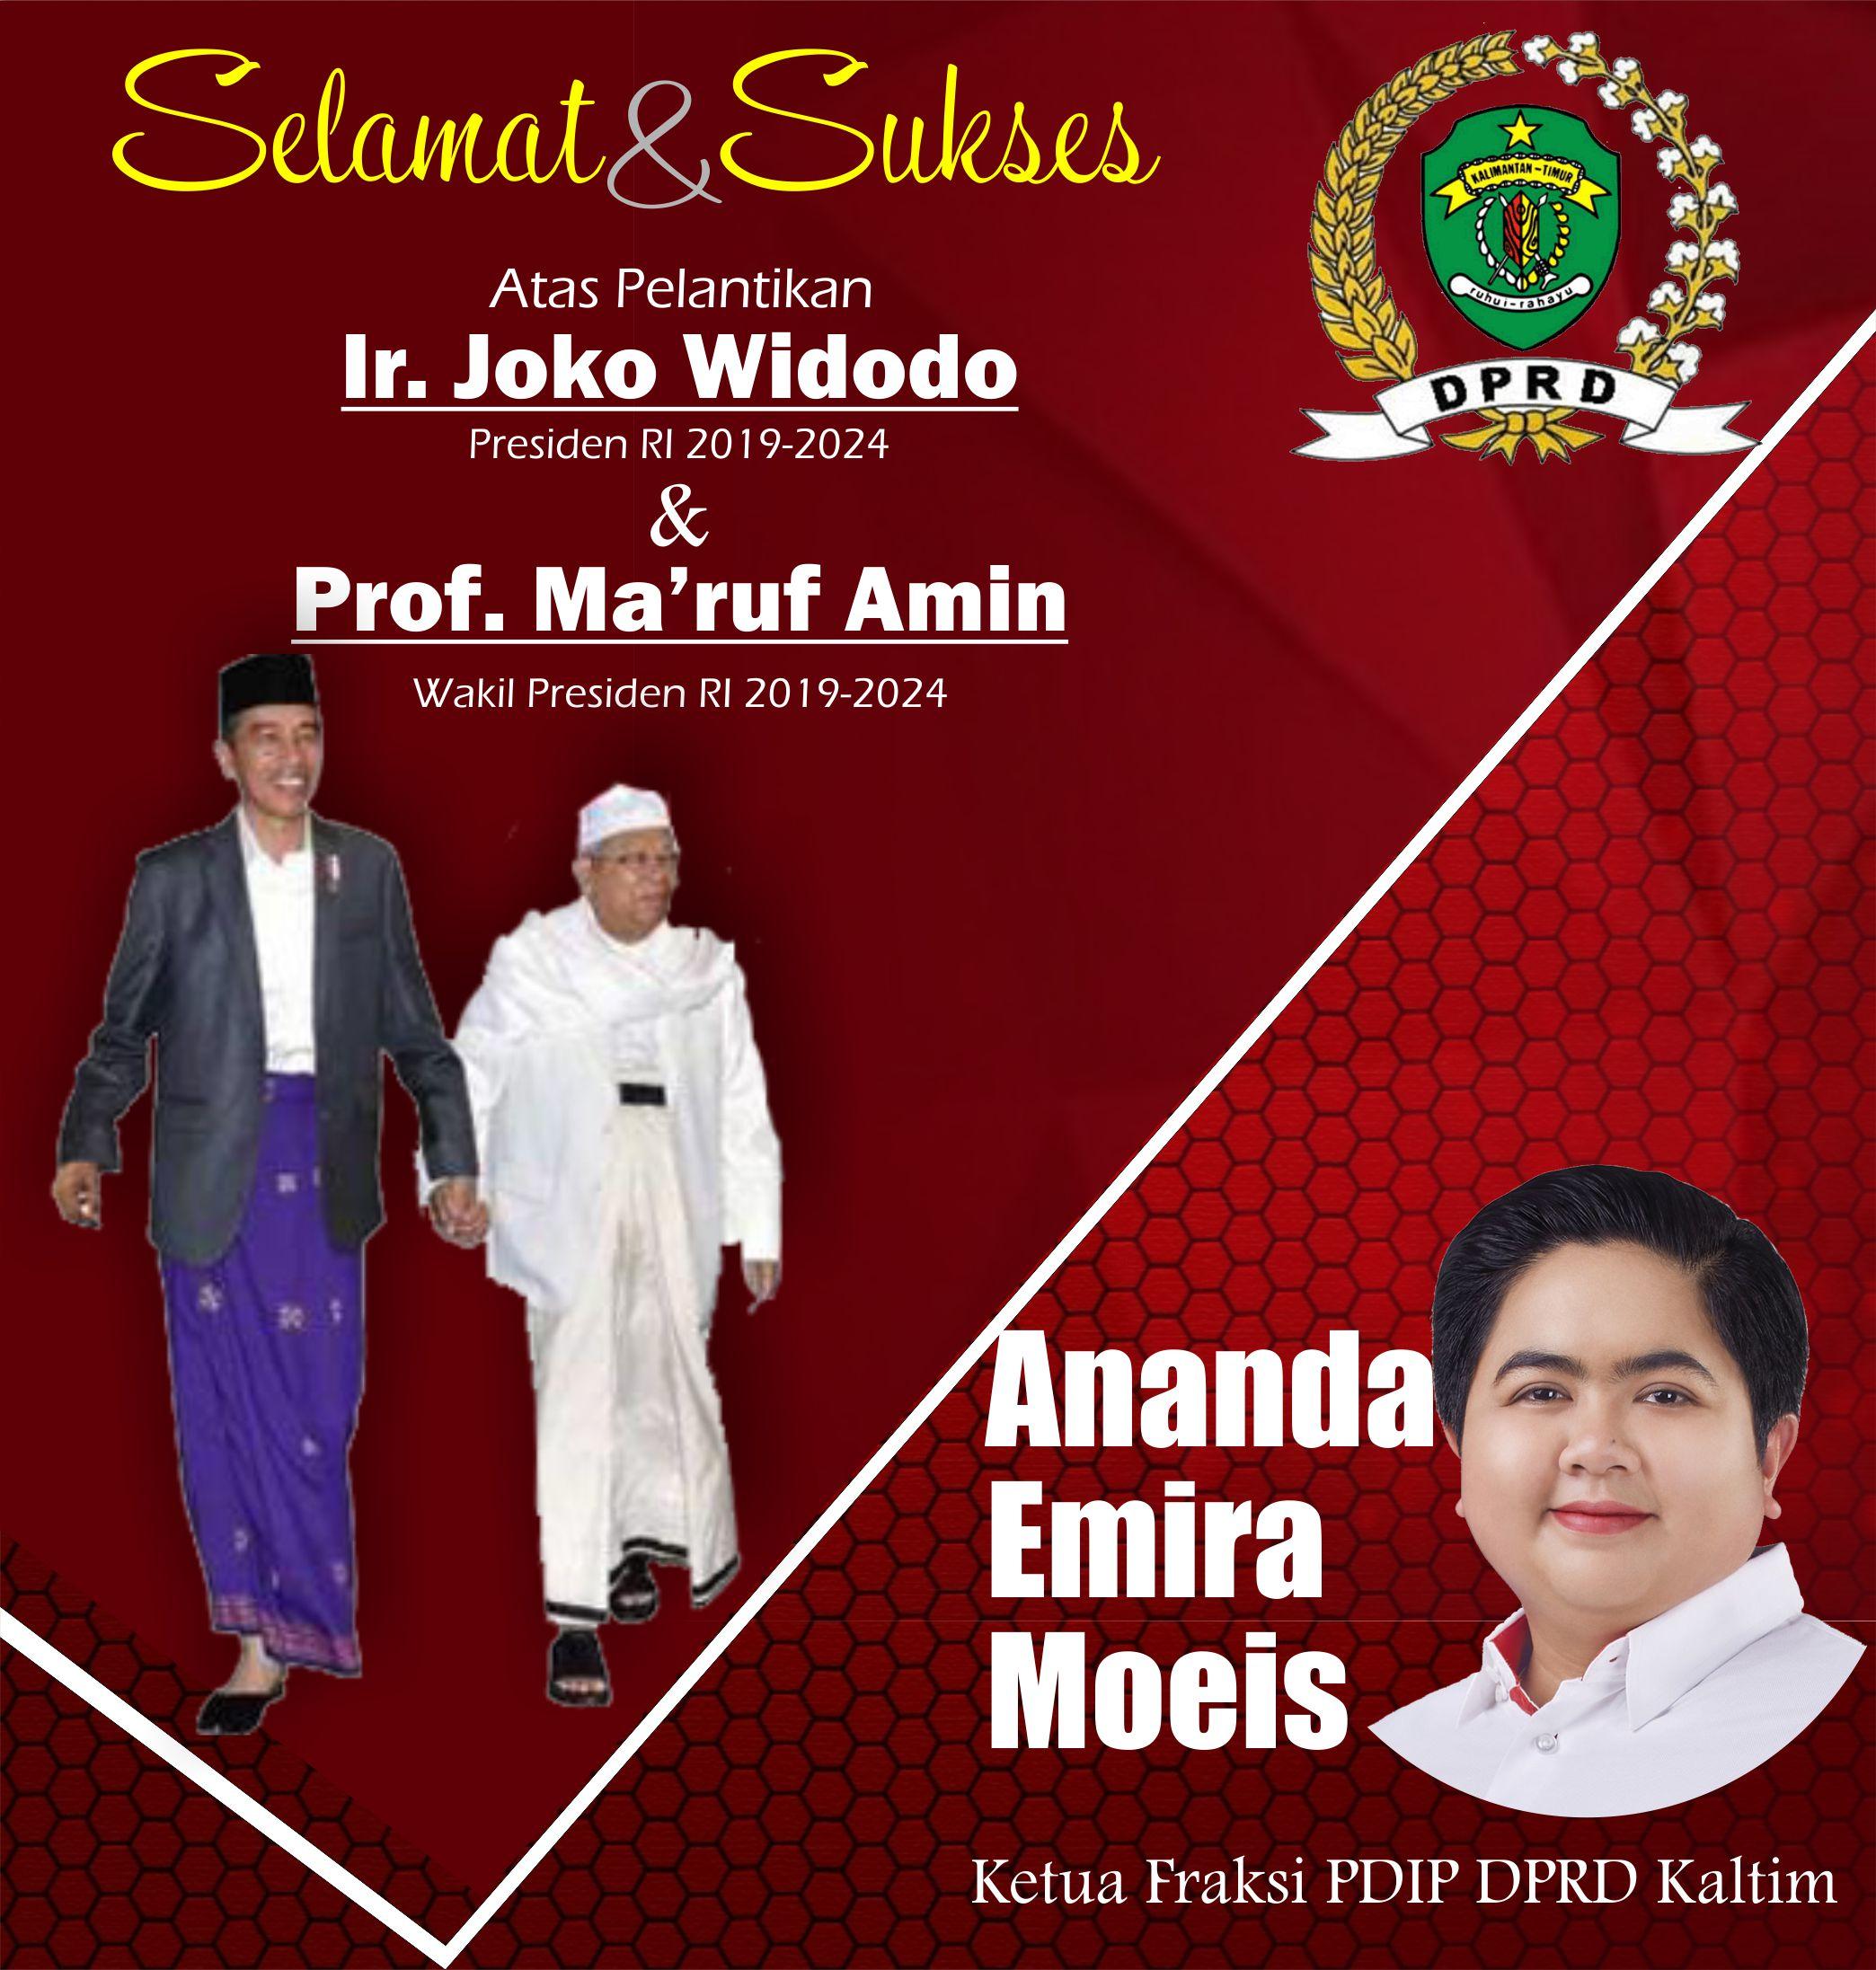 PDIP Ananda Emira Moeis